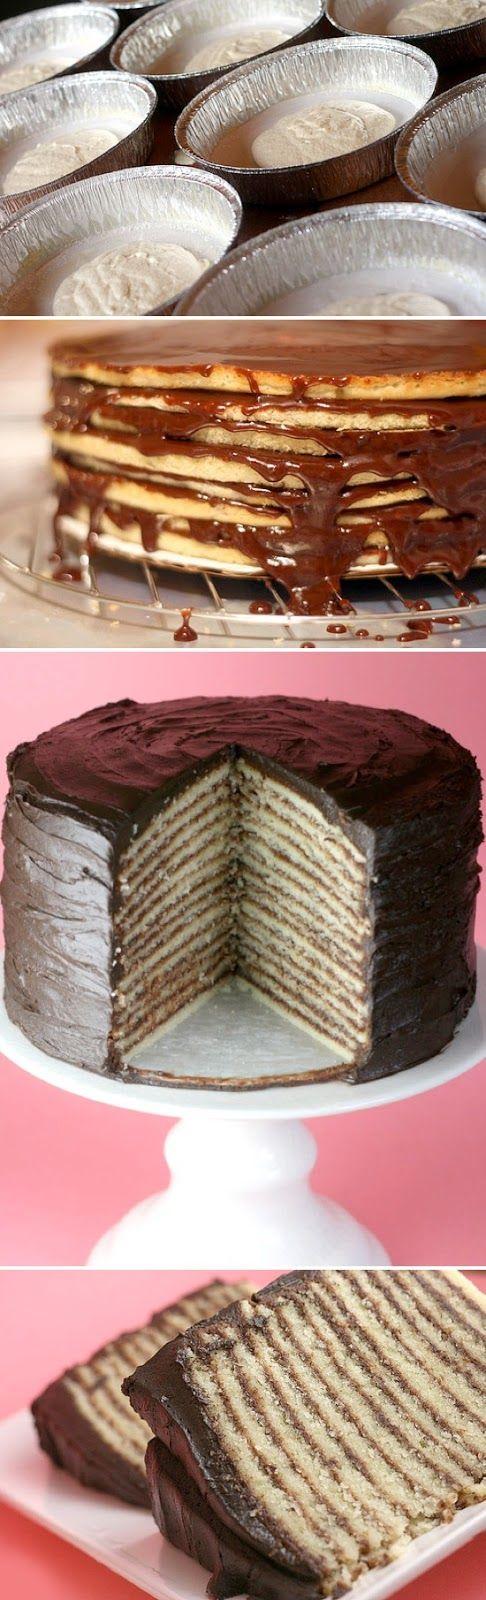 288 best BAKE SALE images on Pinterest | Tennis cake ...